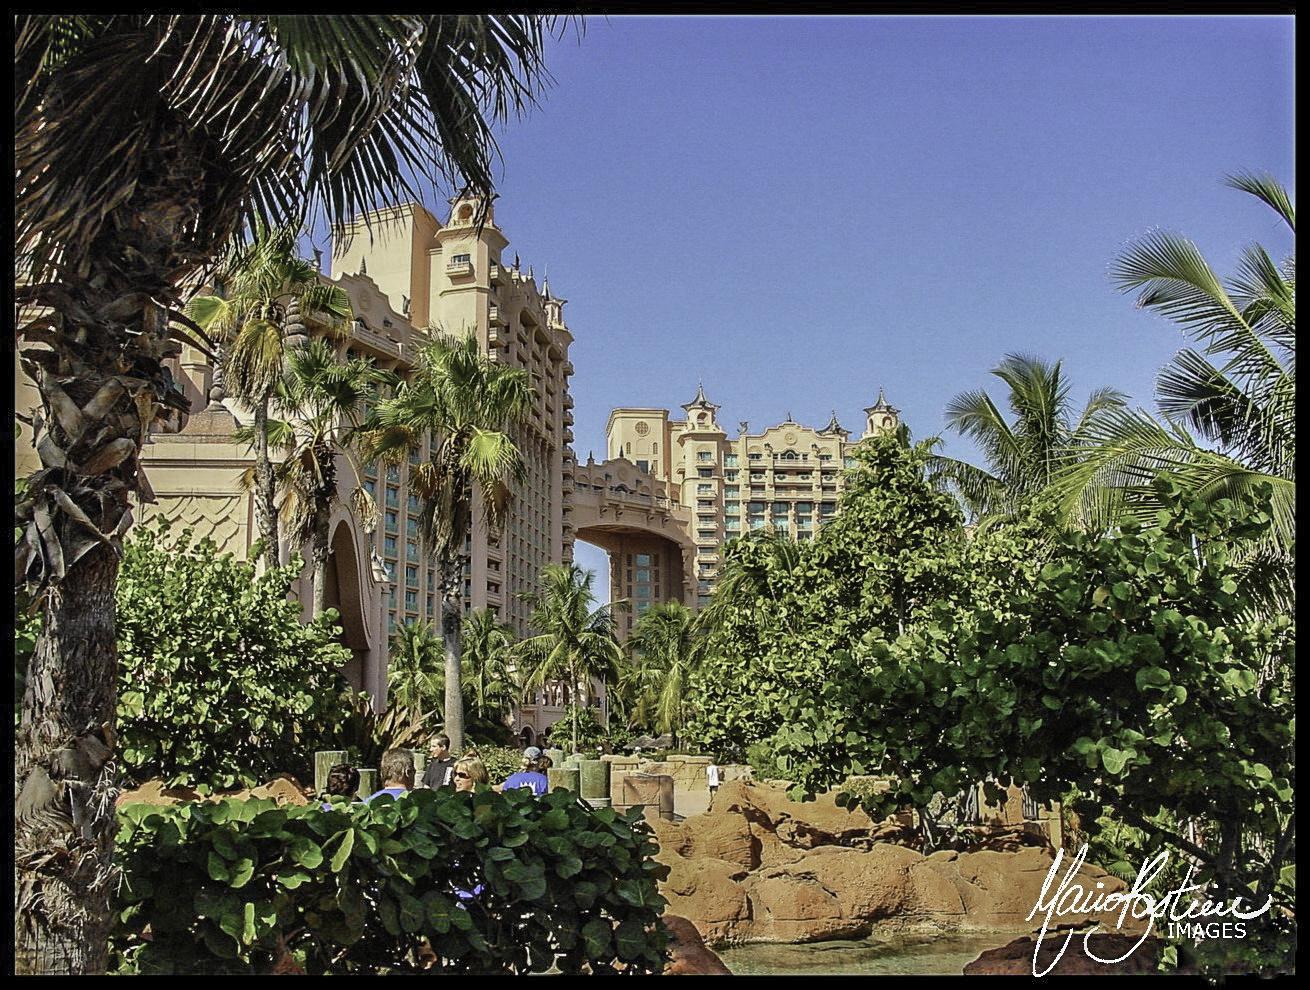 Atlantis Hôtel